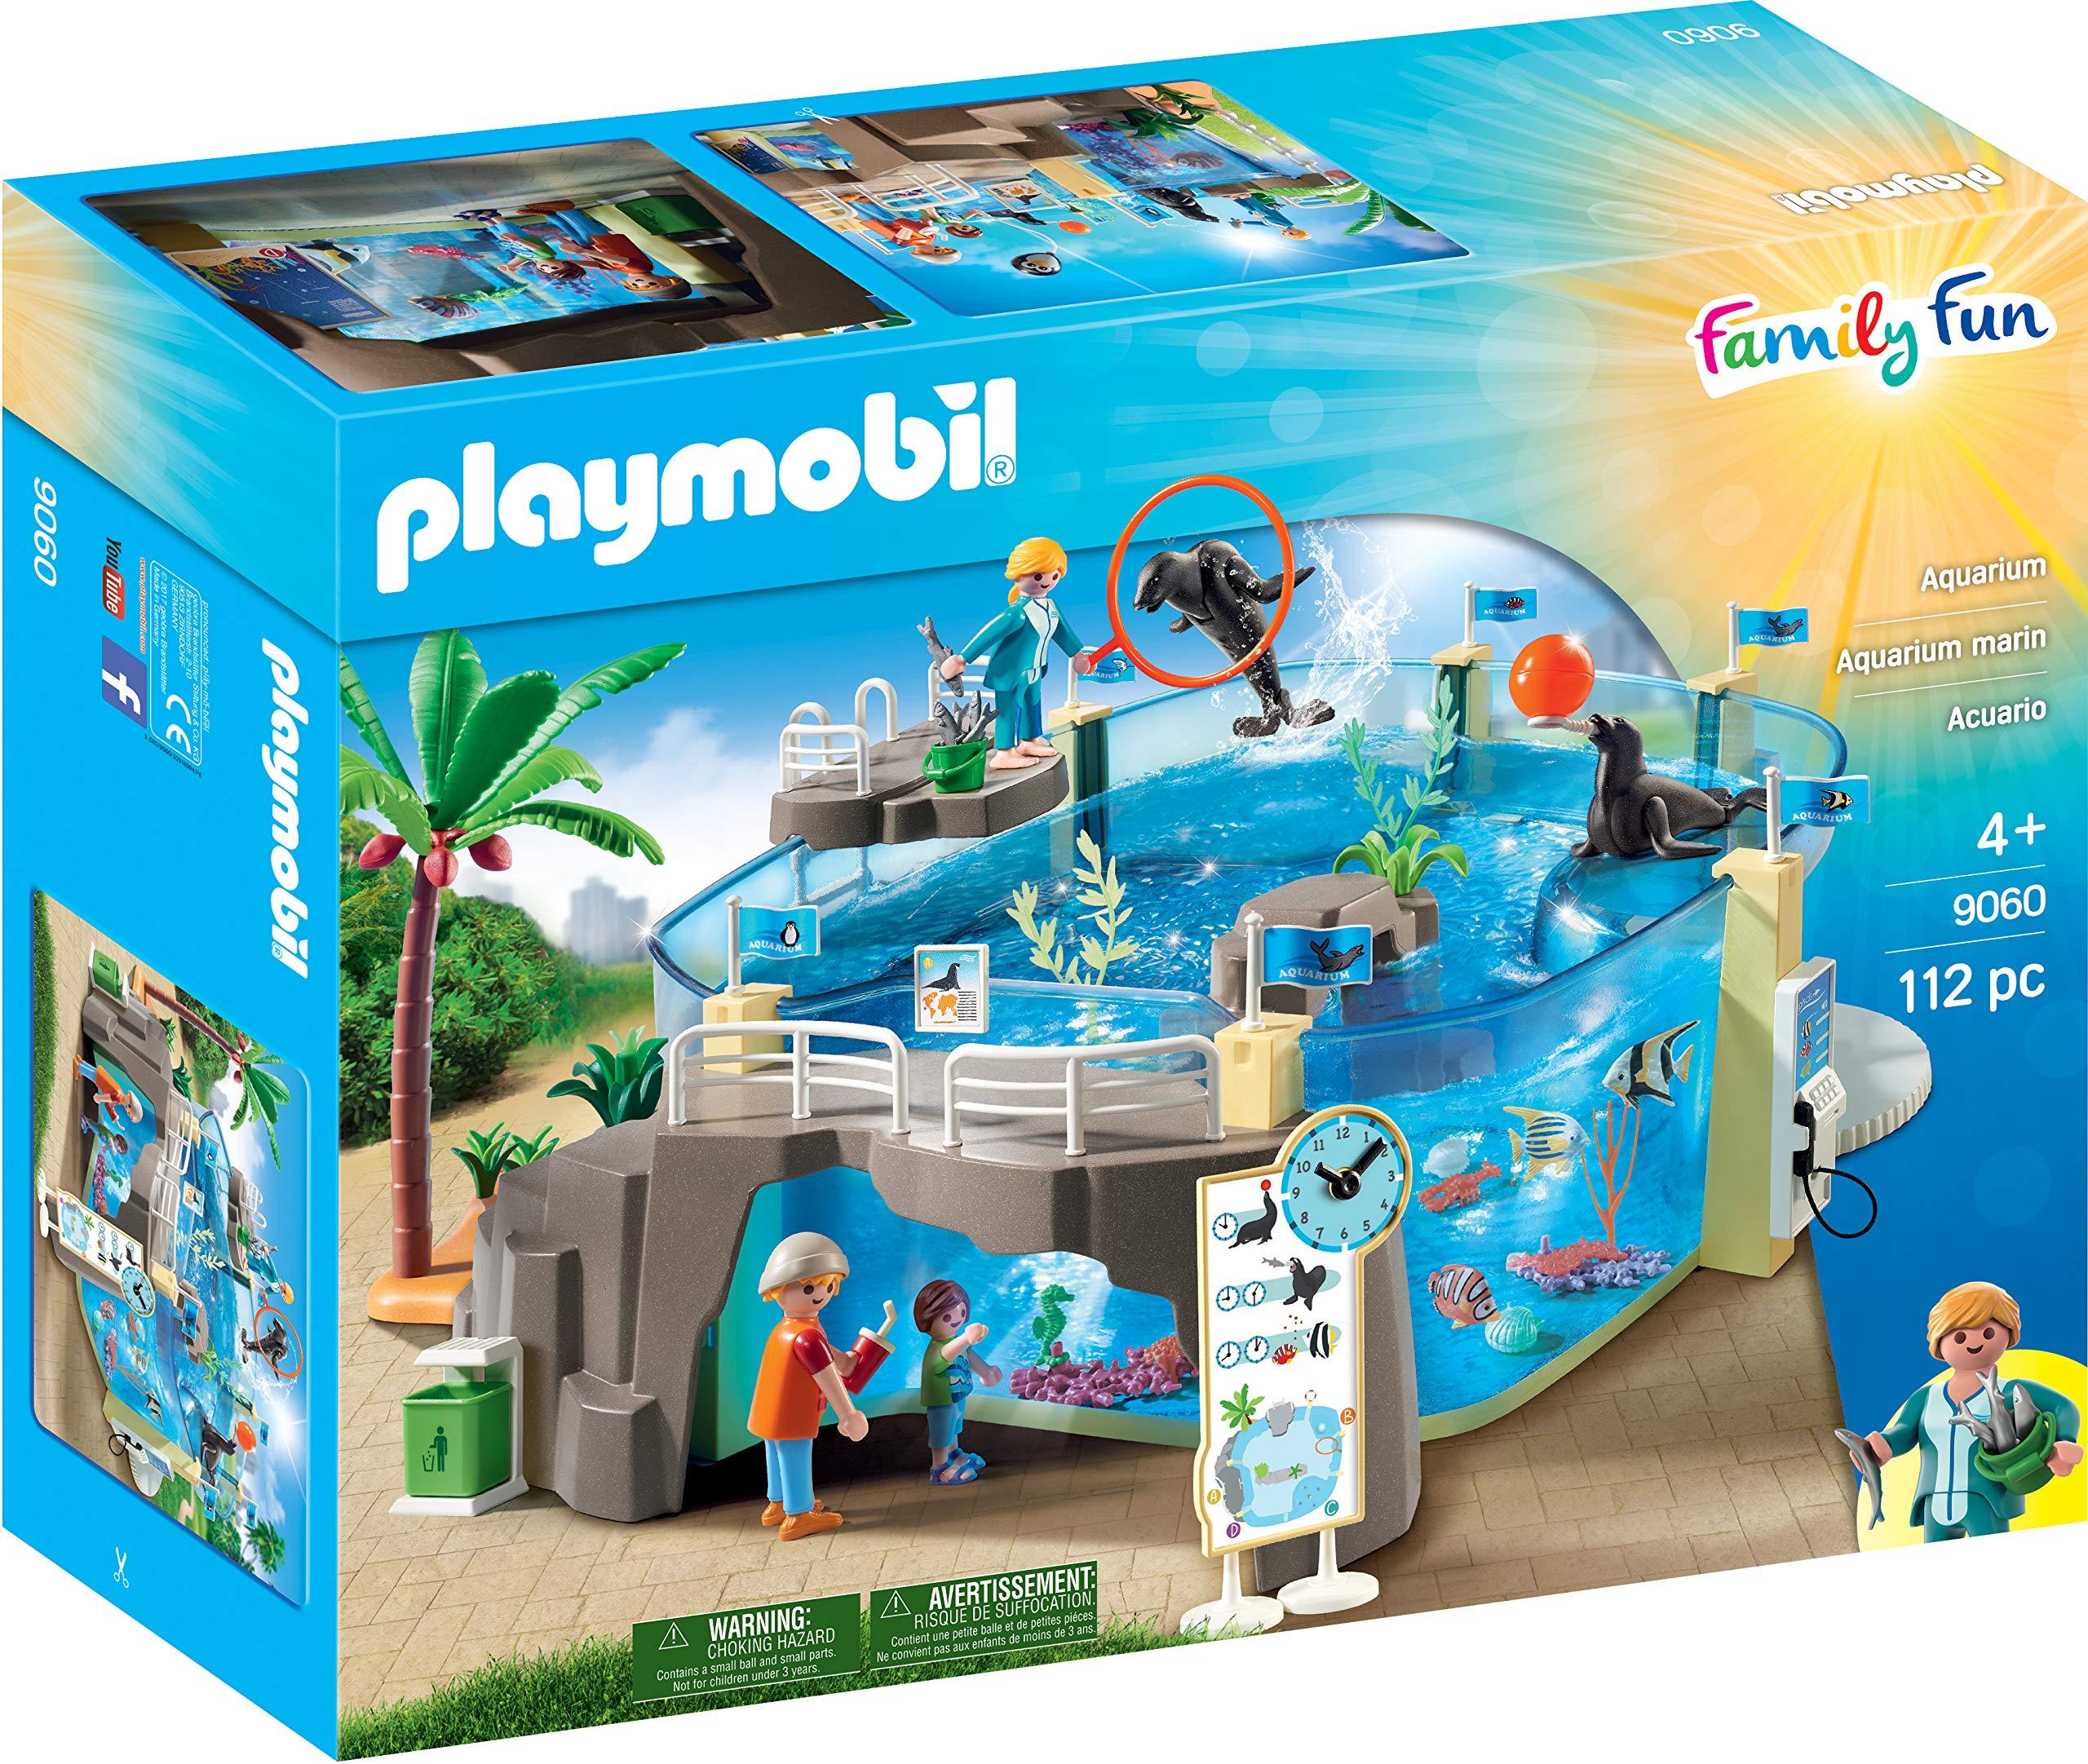 PLAYMOBIL Aquarium Building Set by Playmobil